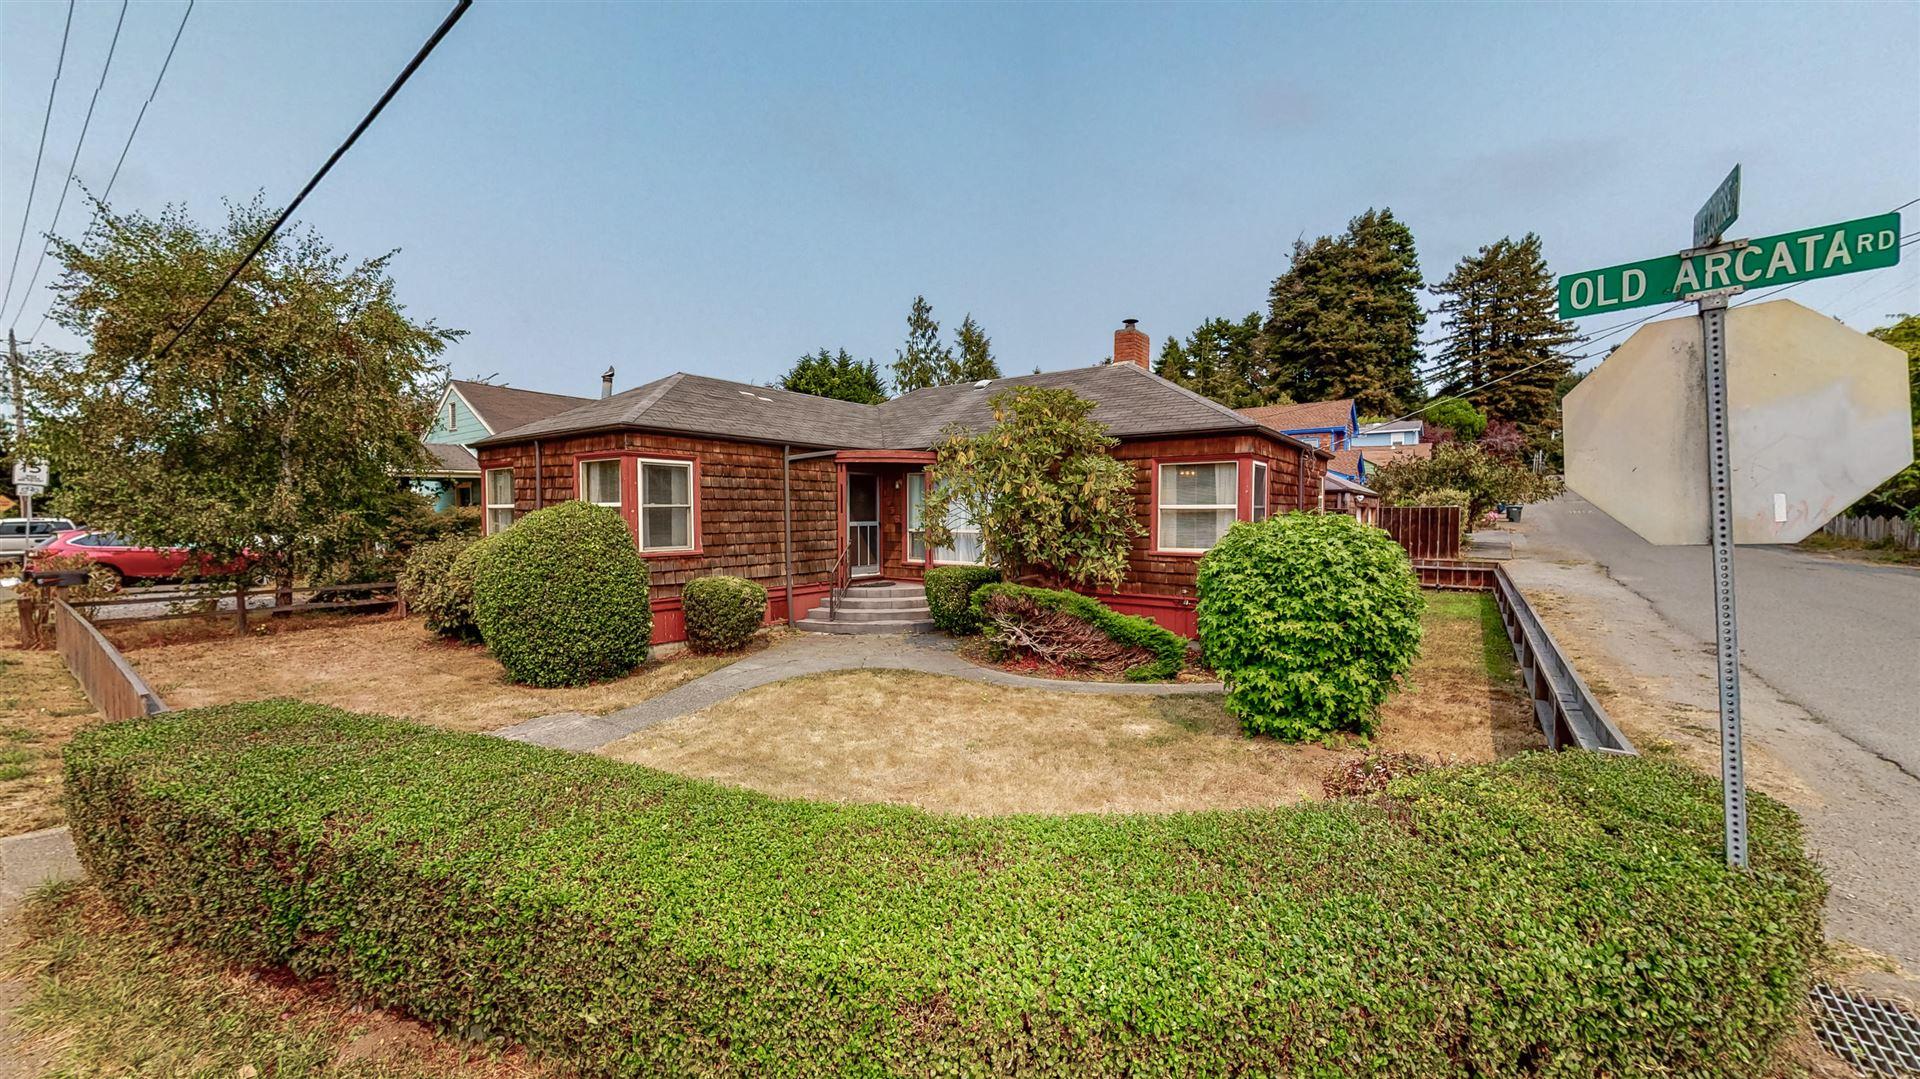 1658 Old Arcata Road, Arcata, CA 95524 - MLS#: 257320